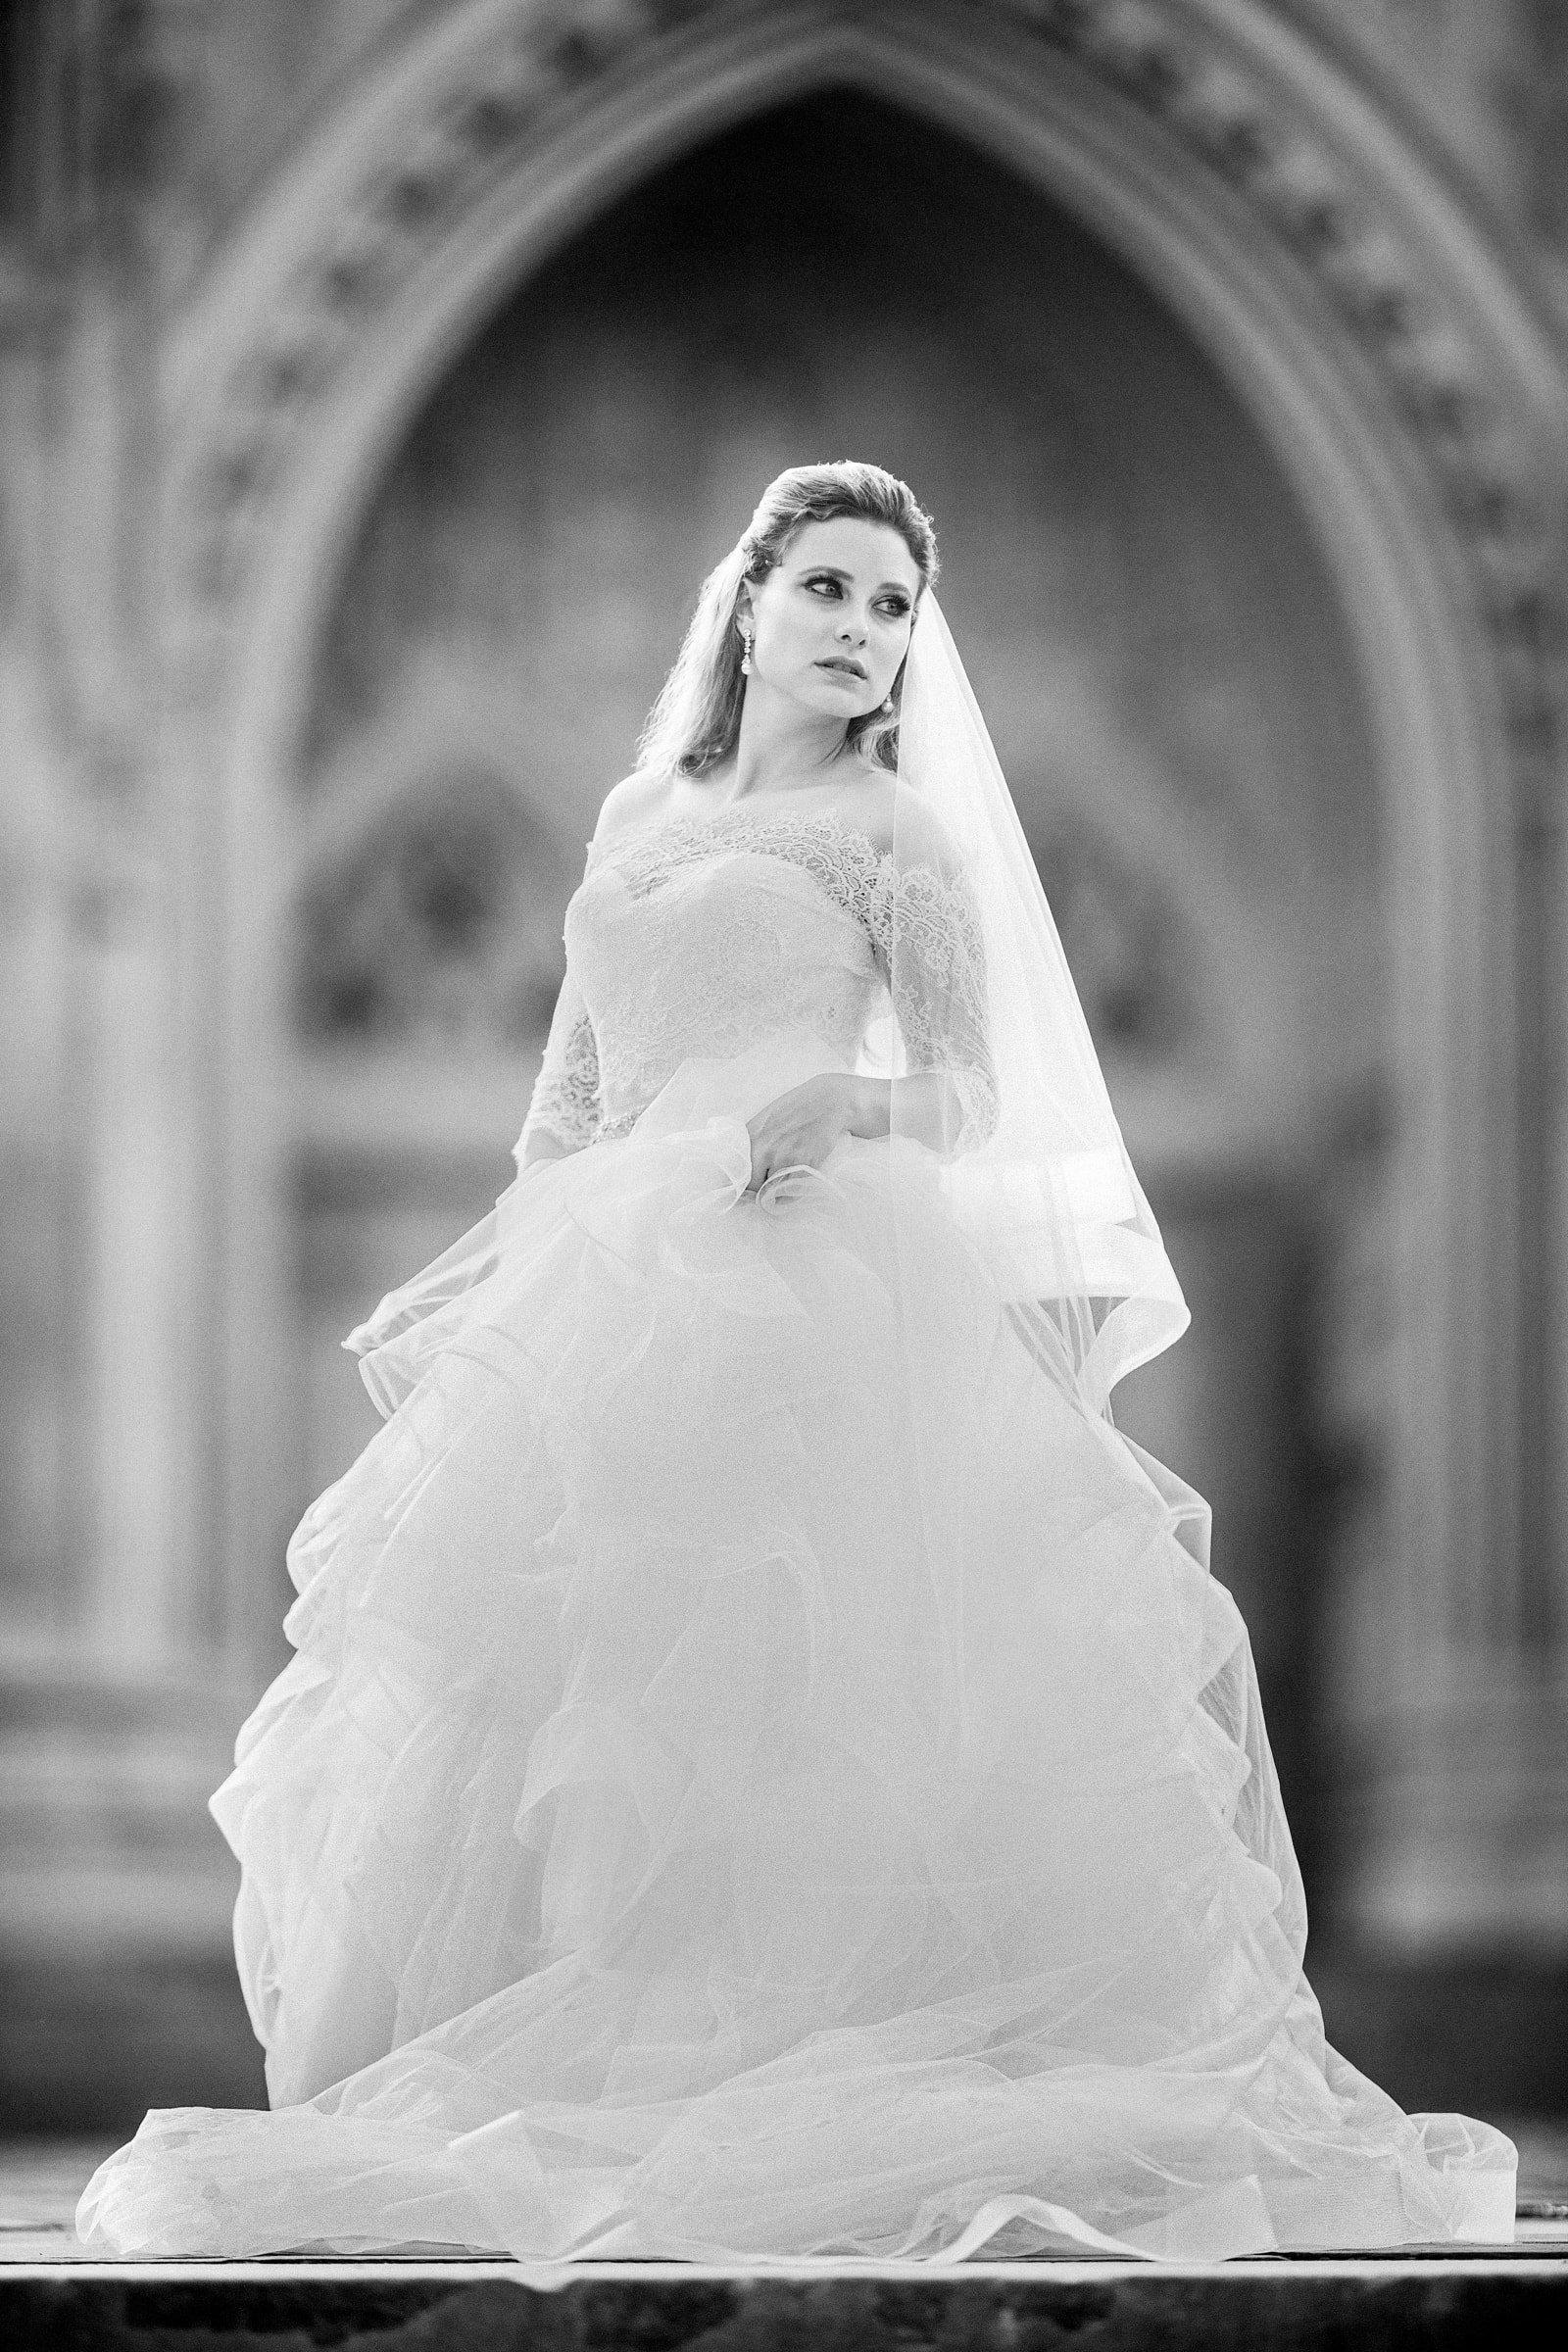 Beautiful Bride in B&W Duke Chapel Bridal Session Image by Joe Payne Photography